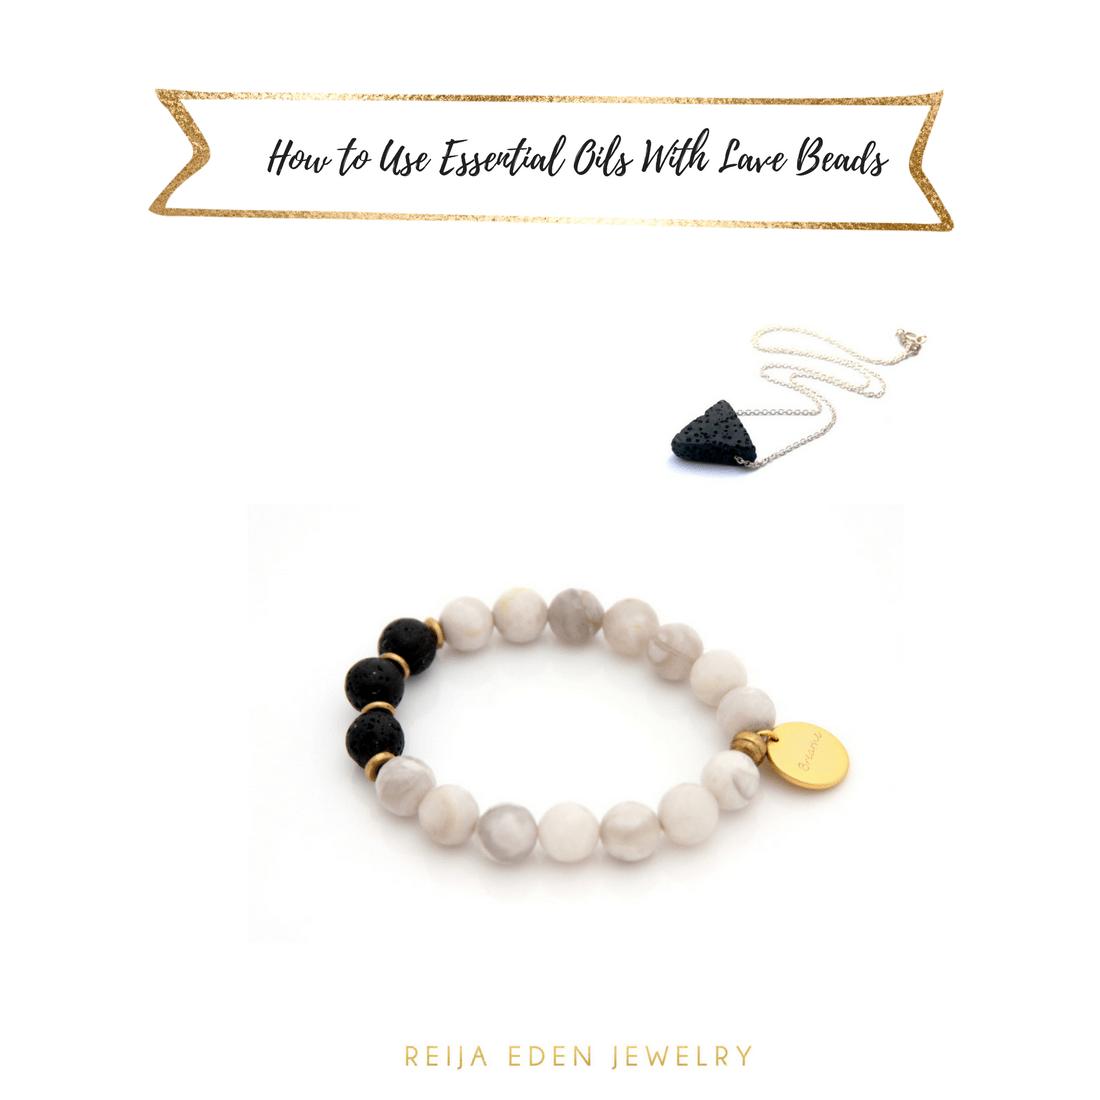 49e9cb47855 How To Use Essential Oils With Lava Beads? | Reija Eden Jewelry